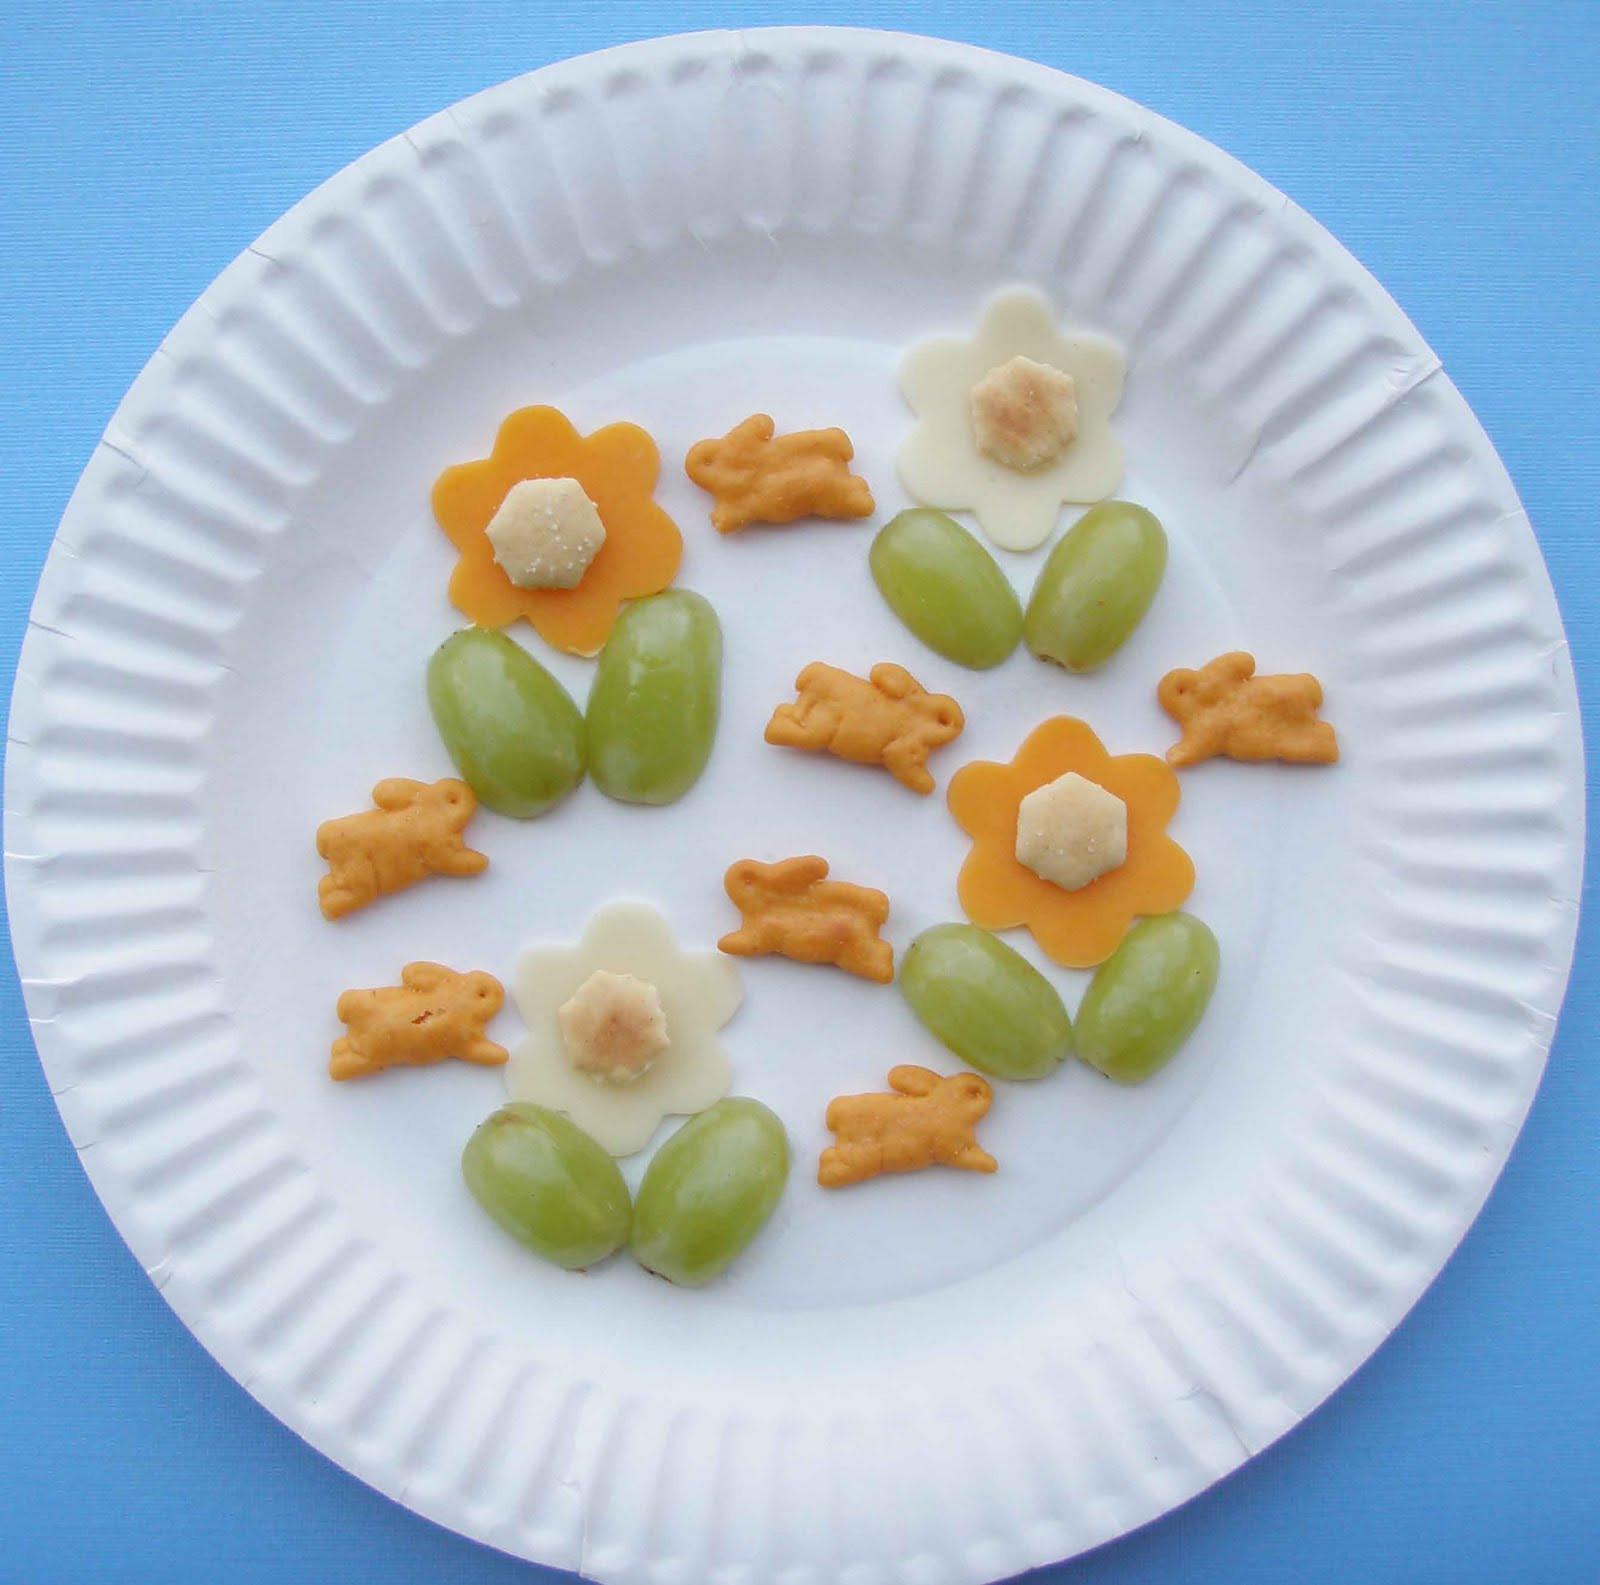 Healthy Preschool Snacks  Crack of Dawn Crafts Growing a Garden Healthy Preschool Snack